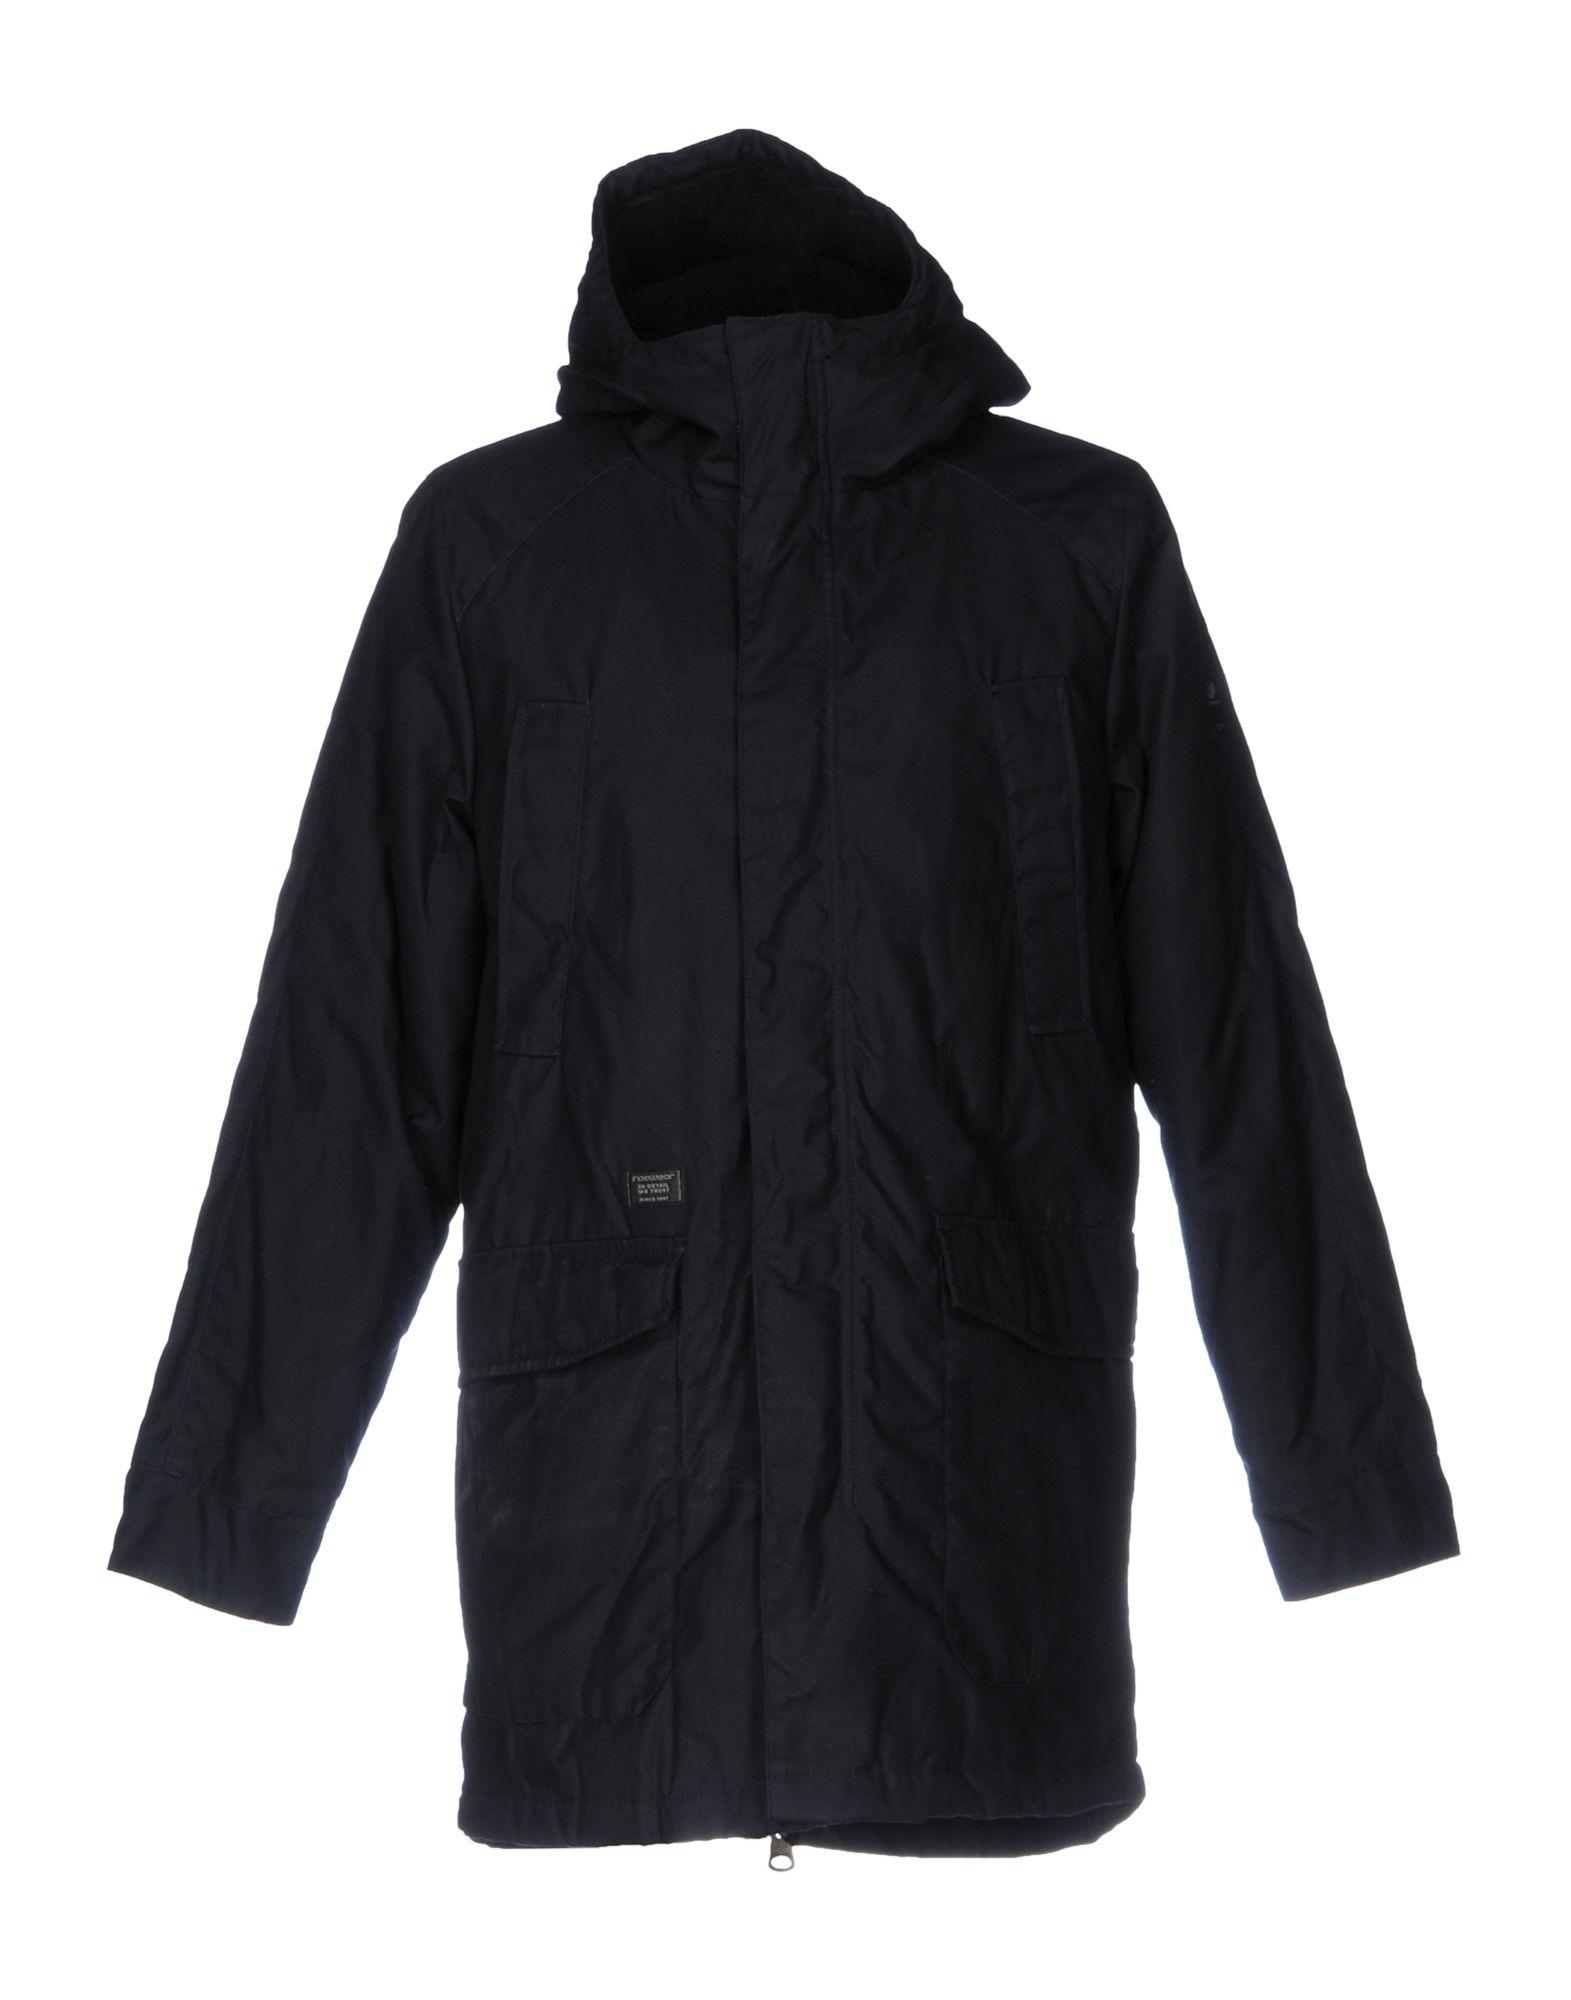 RAGWEAR Herren Jacke Farbe Dunkelblau Größe 6